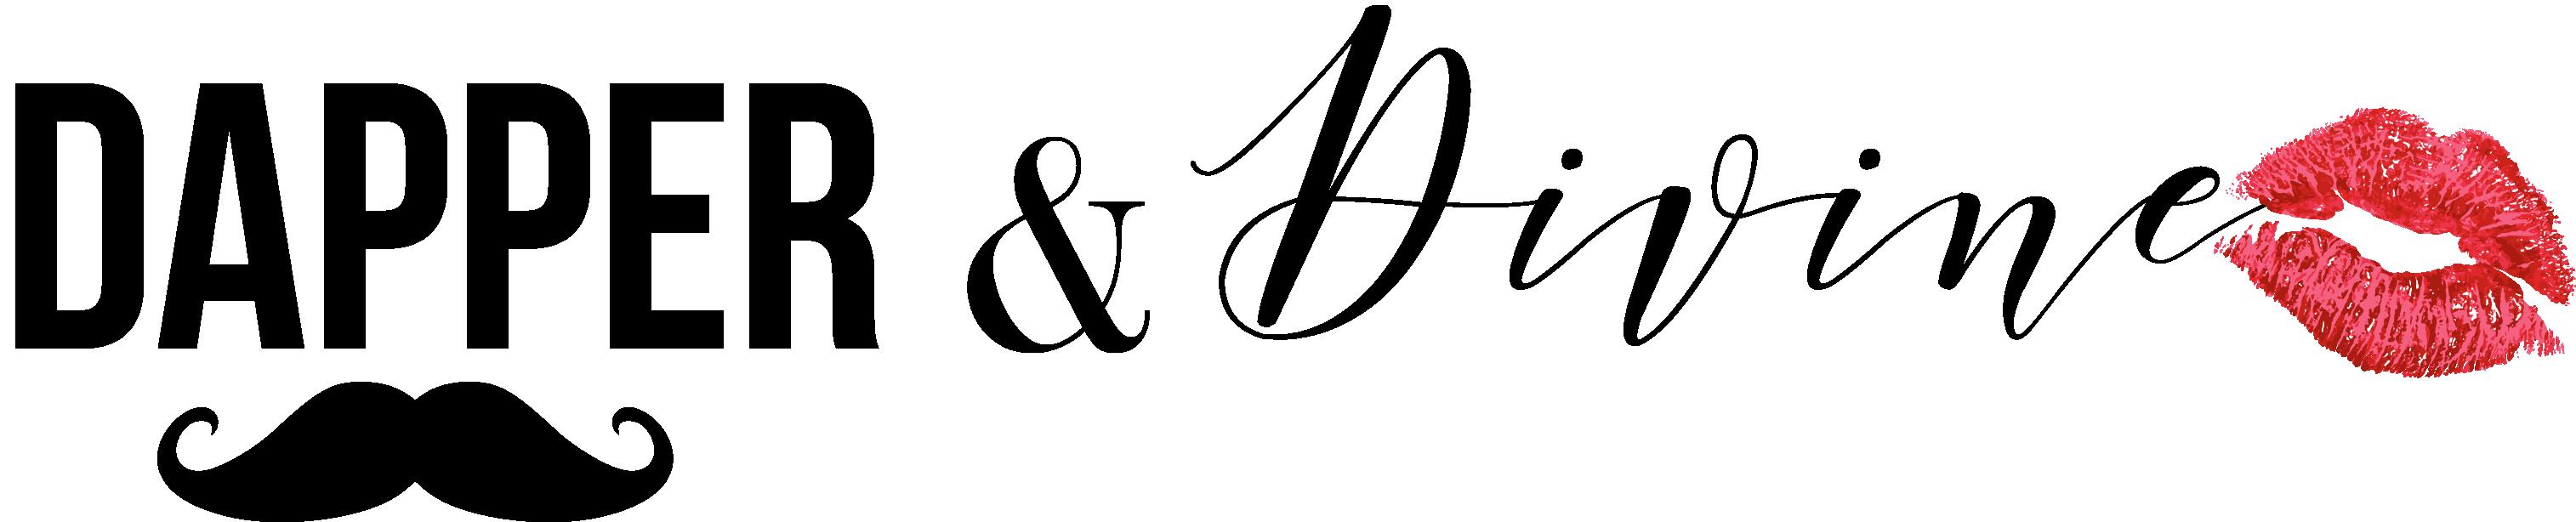 DD (1)